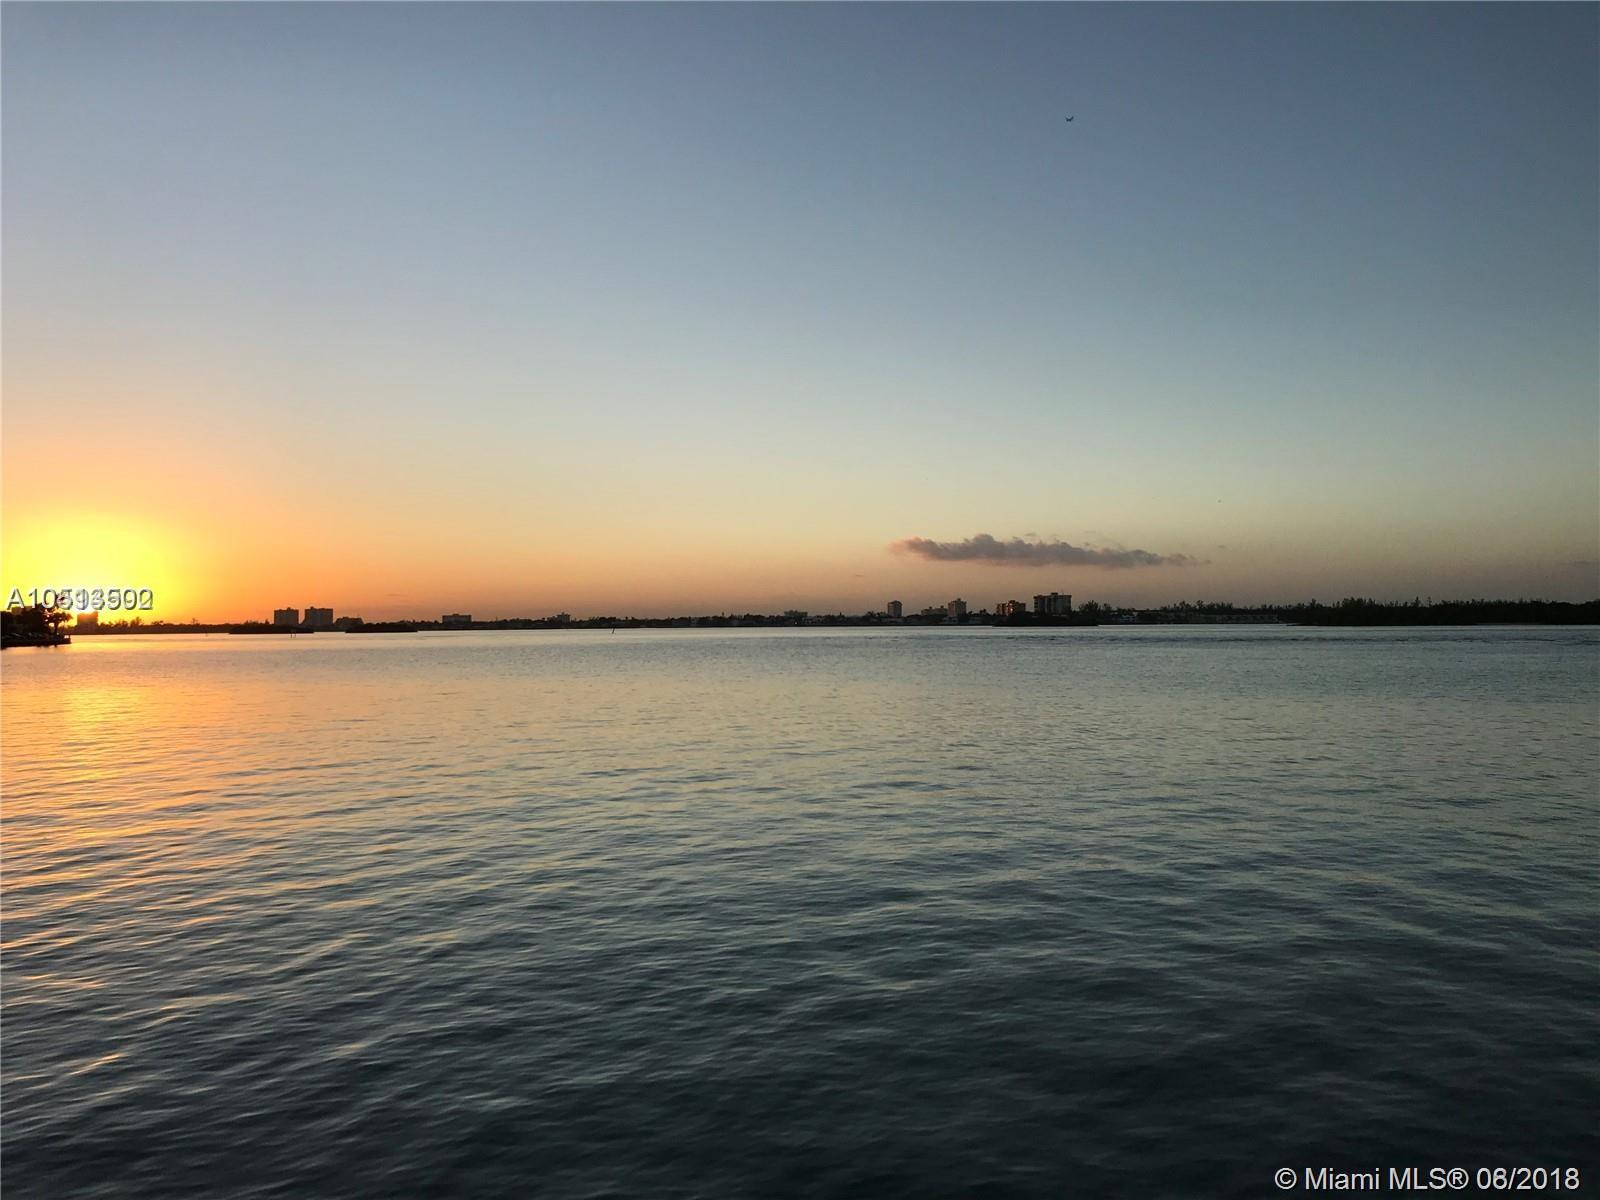 10312 W Broadview Dr, Bay Harbor Islands, FL 33154 - Bay Harbor Islands, FL real estate listing